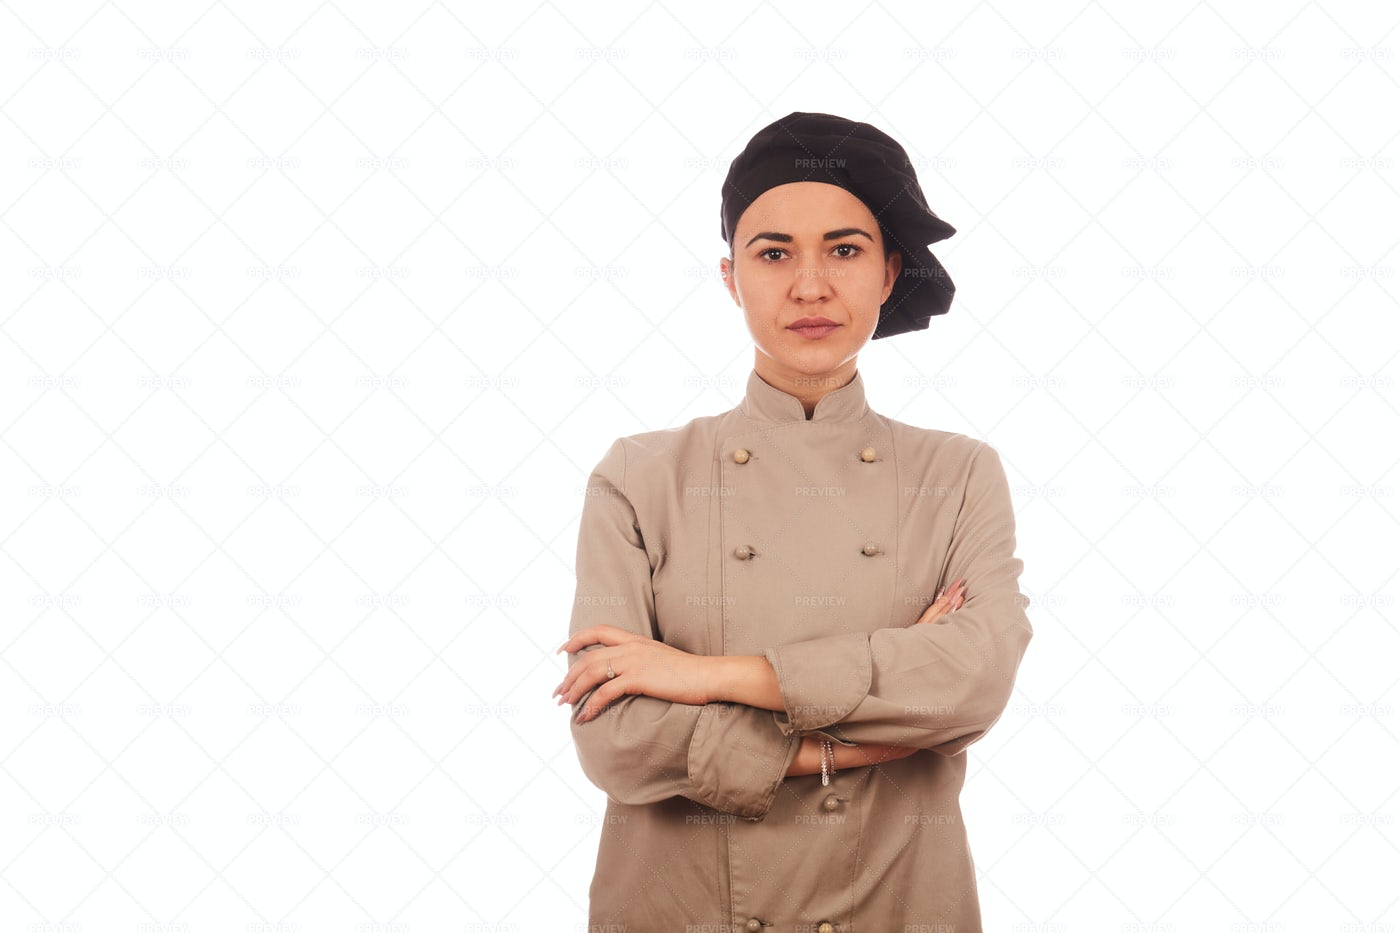 Serious Chef: Stock Photos